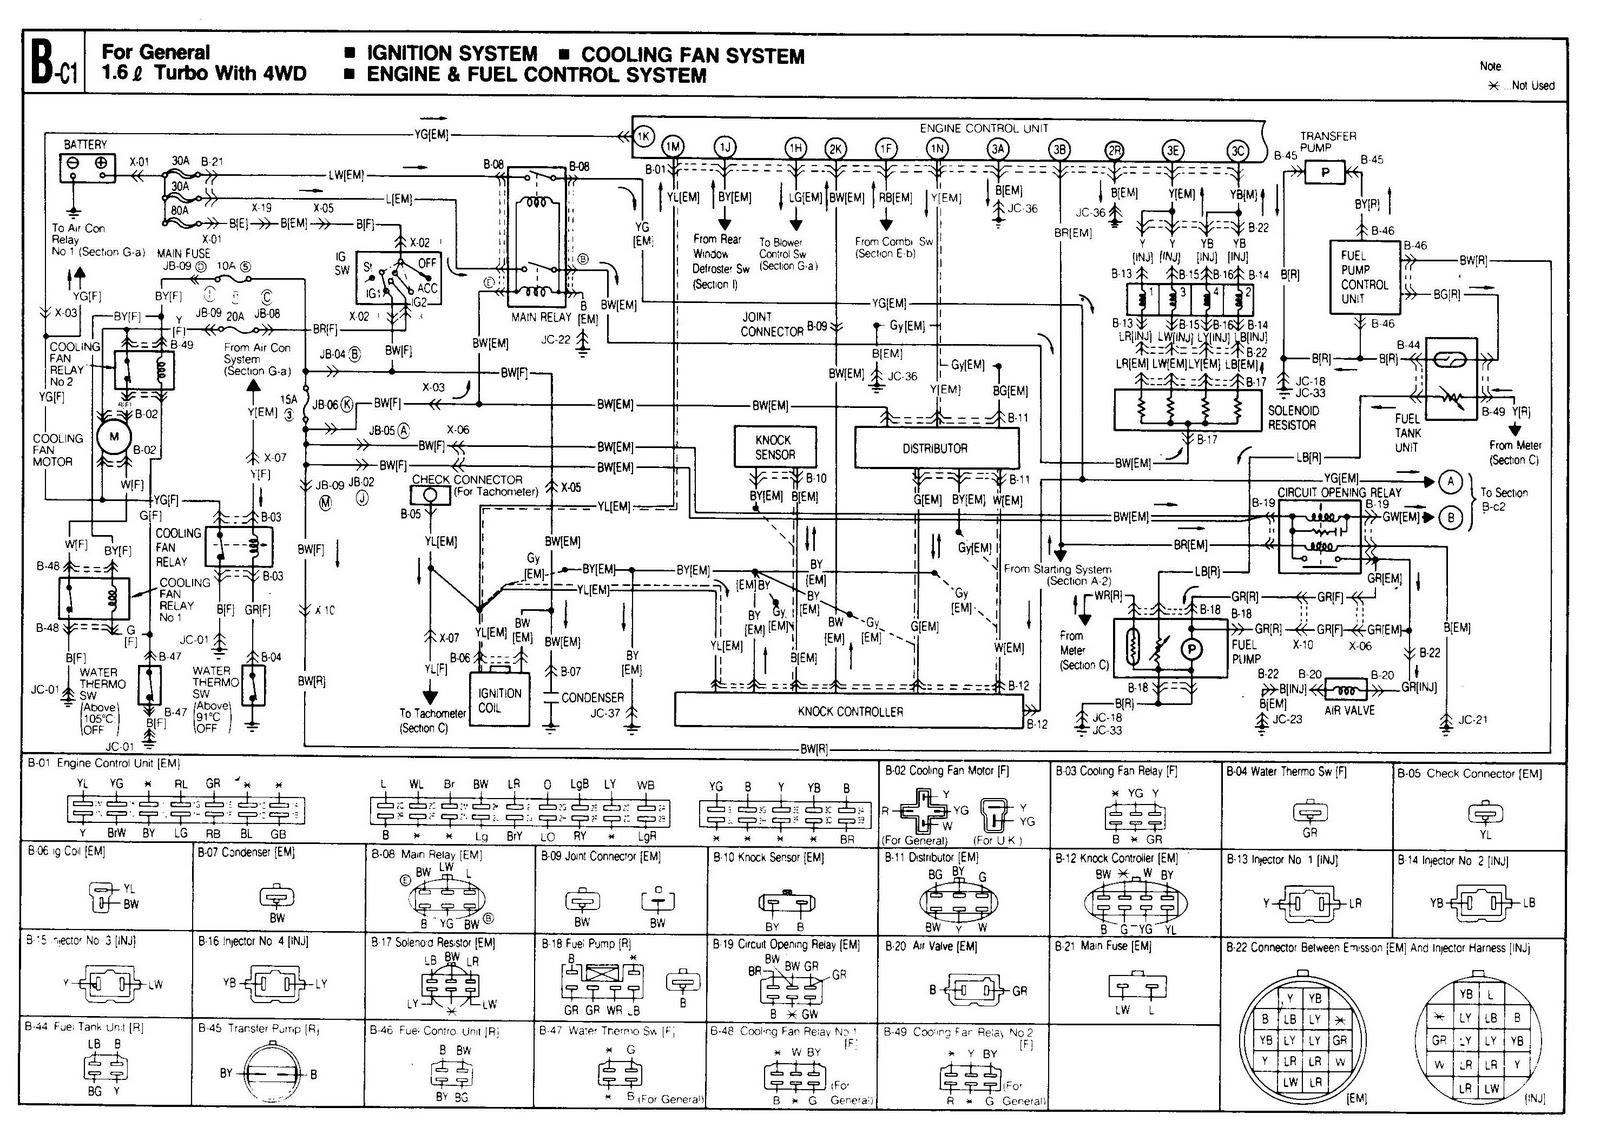 97 Mazda 626 Engine Diagram | Wiring Diagram - Automobile Wiring Diagram